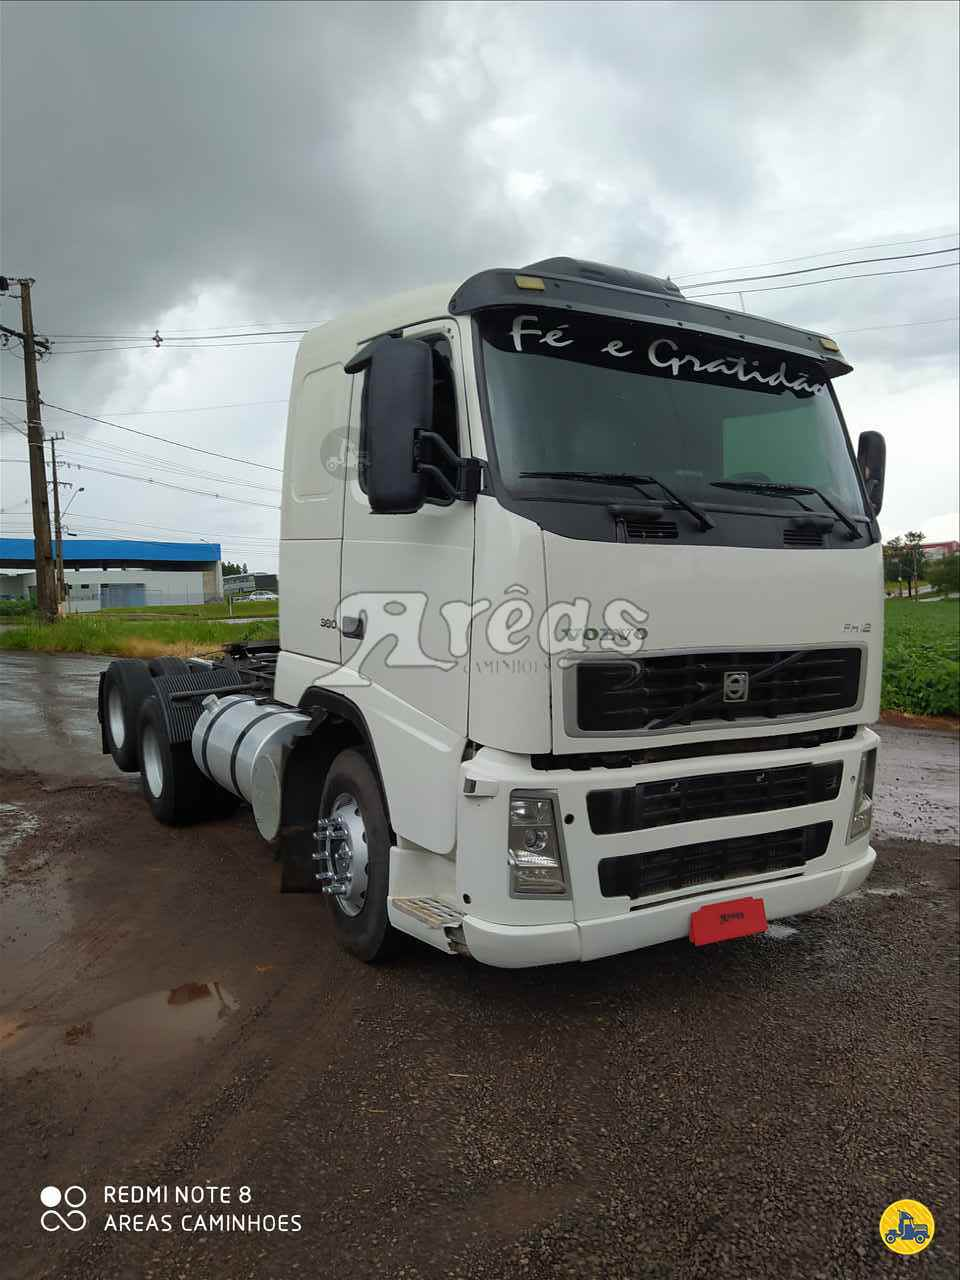 CAMINHAO VOLVO VOLVO FH12 380 Cavalo Mecânico Truck 6x2 Arêas Caminhões MARINGA PARANÁ PR